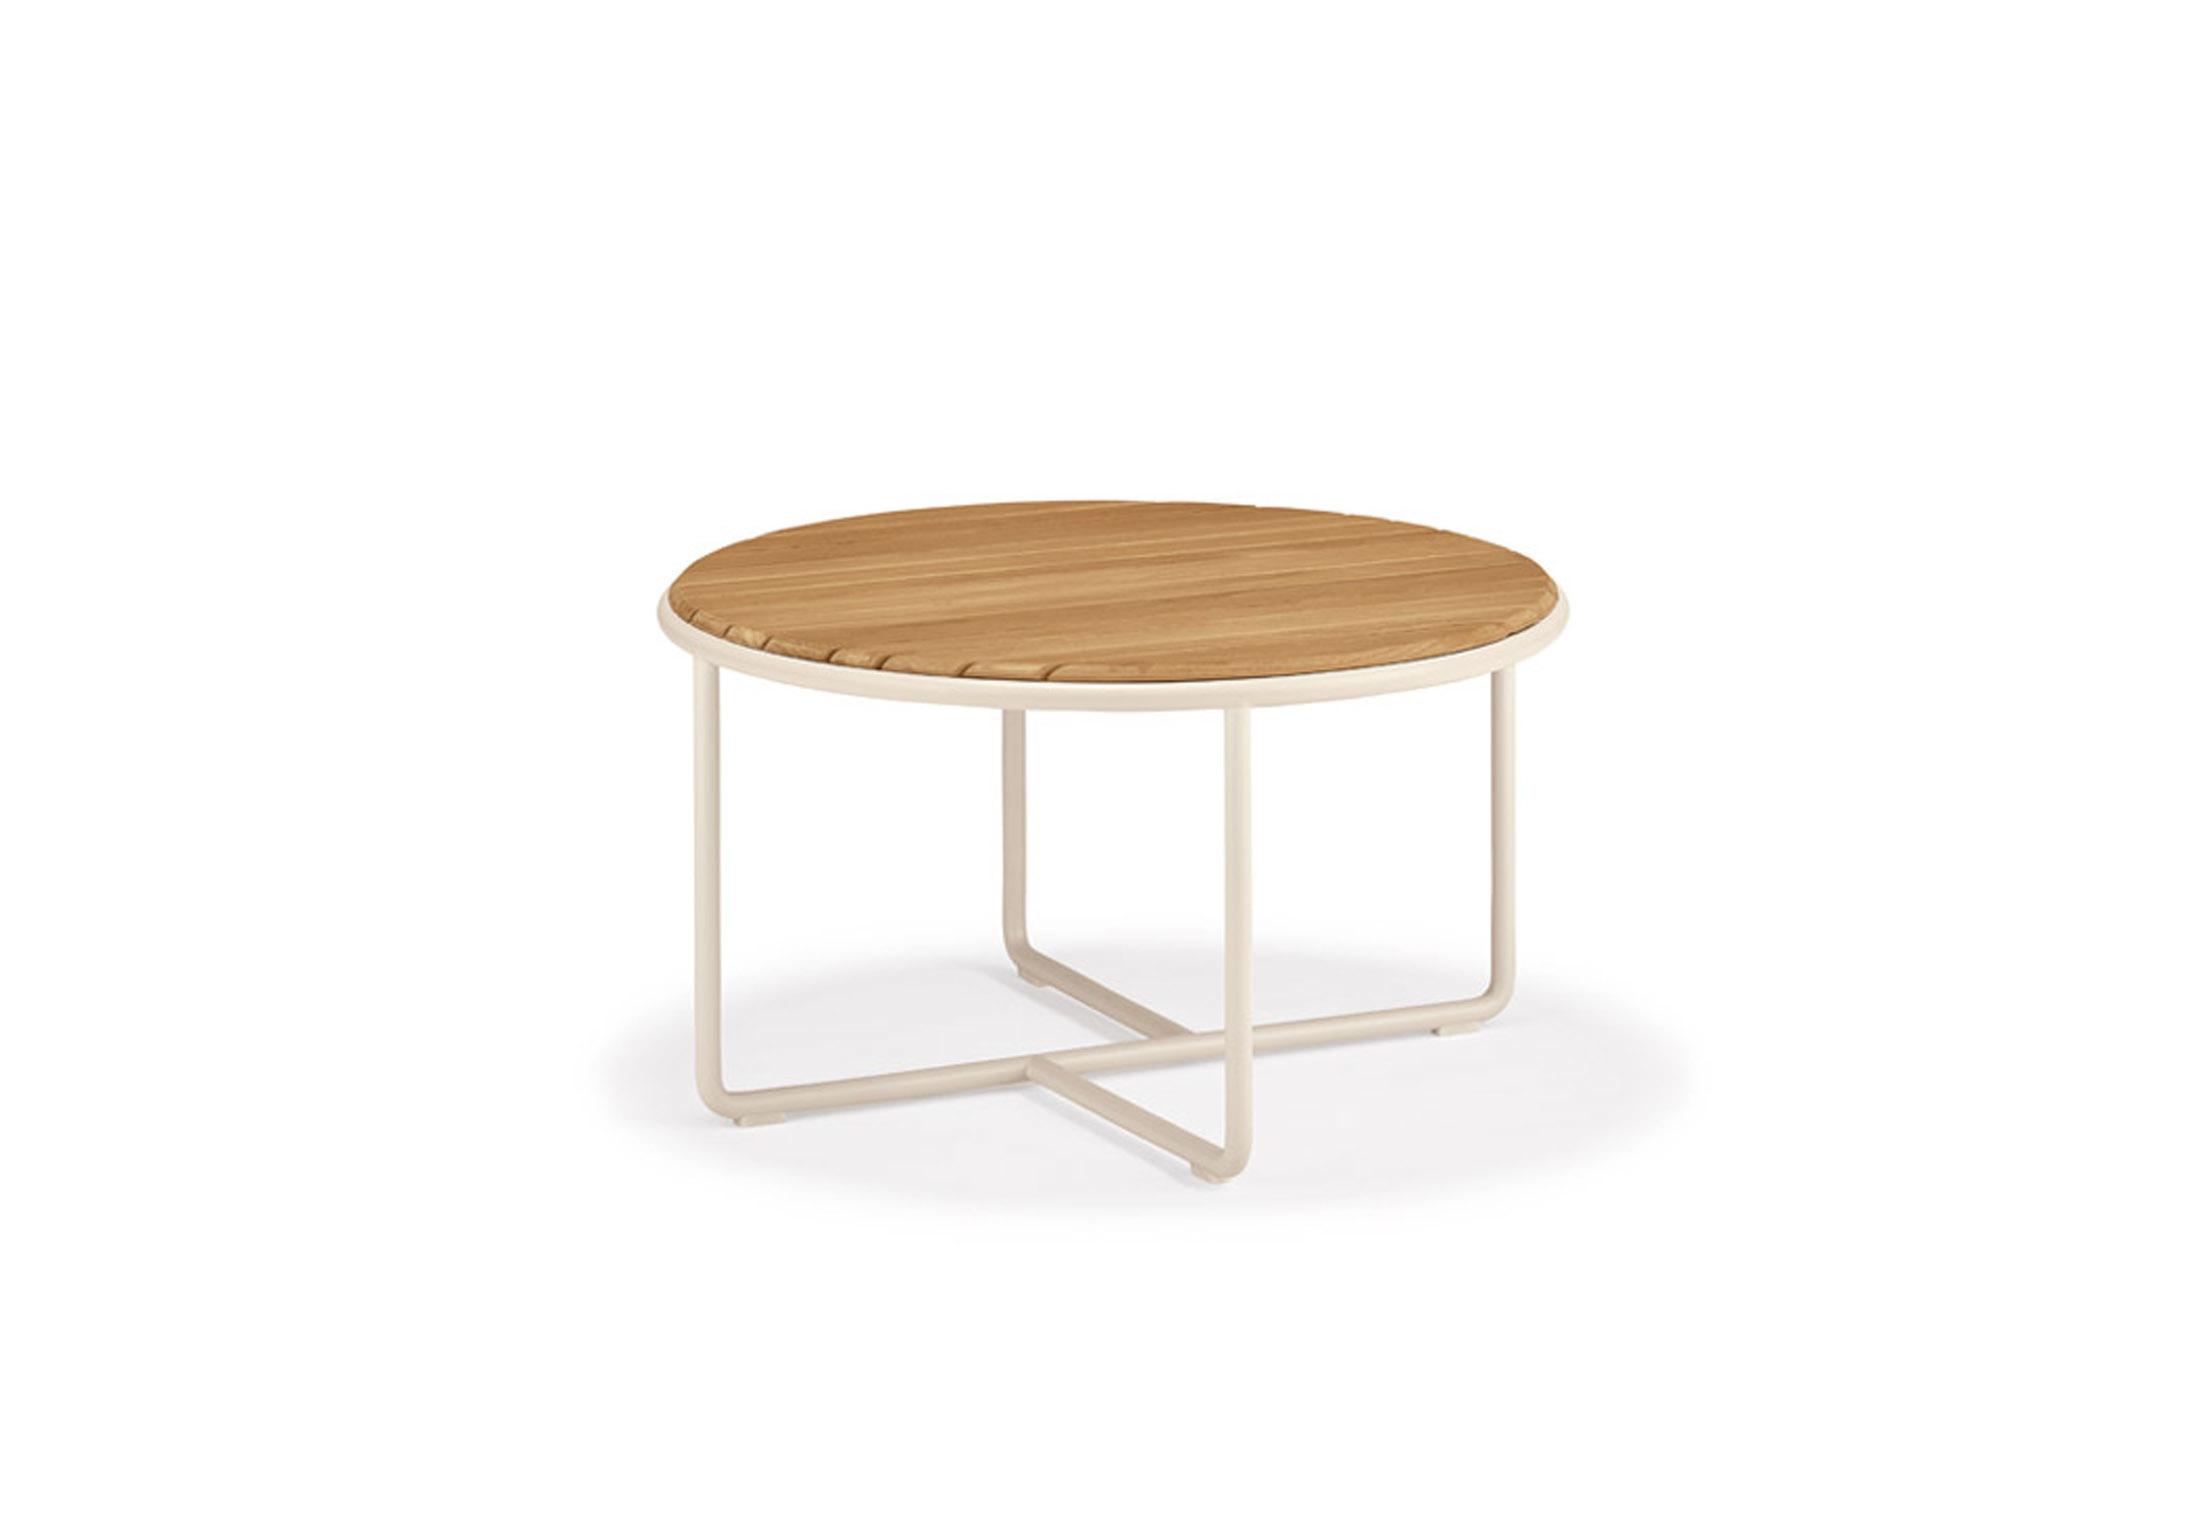 LOU coffee table by DEDON